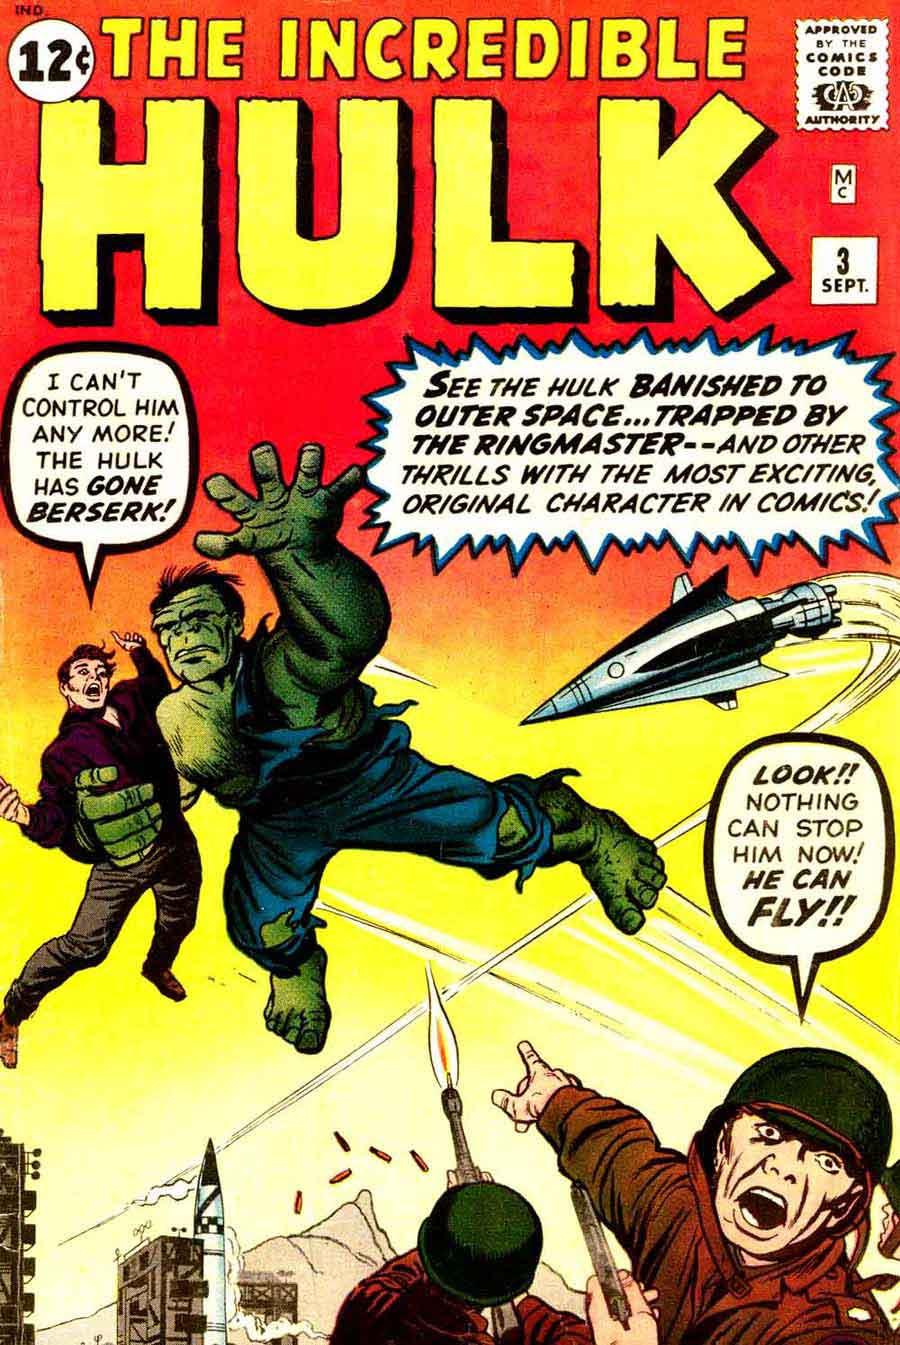 Incredible Hulk v1 3# marvel comic book cover art by Jack Kirby